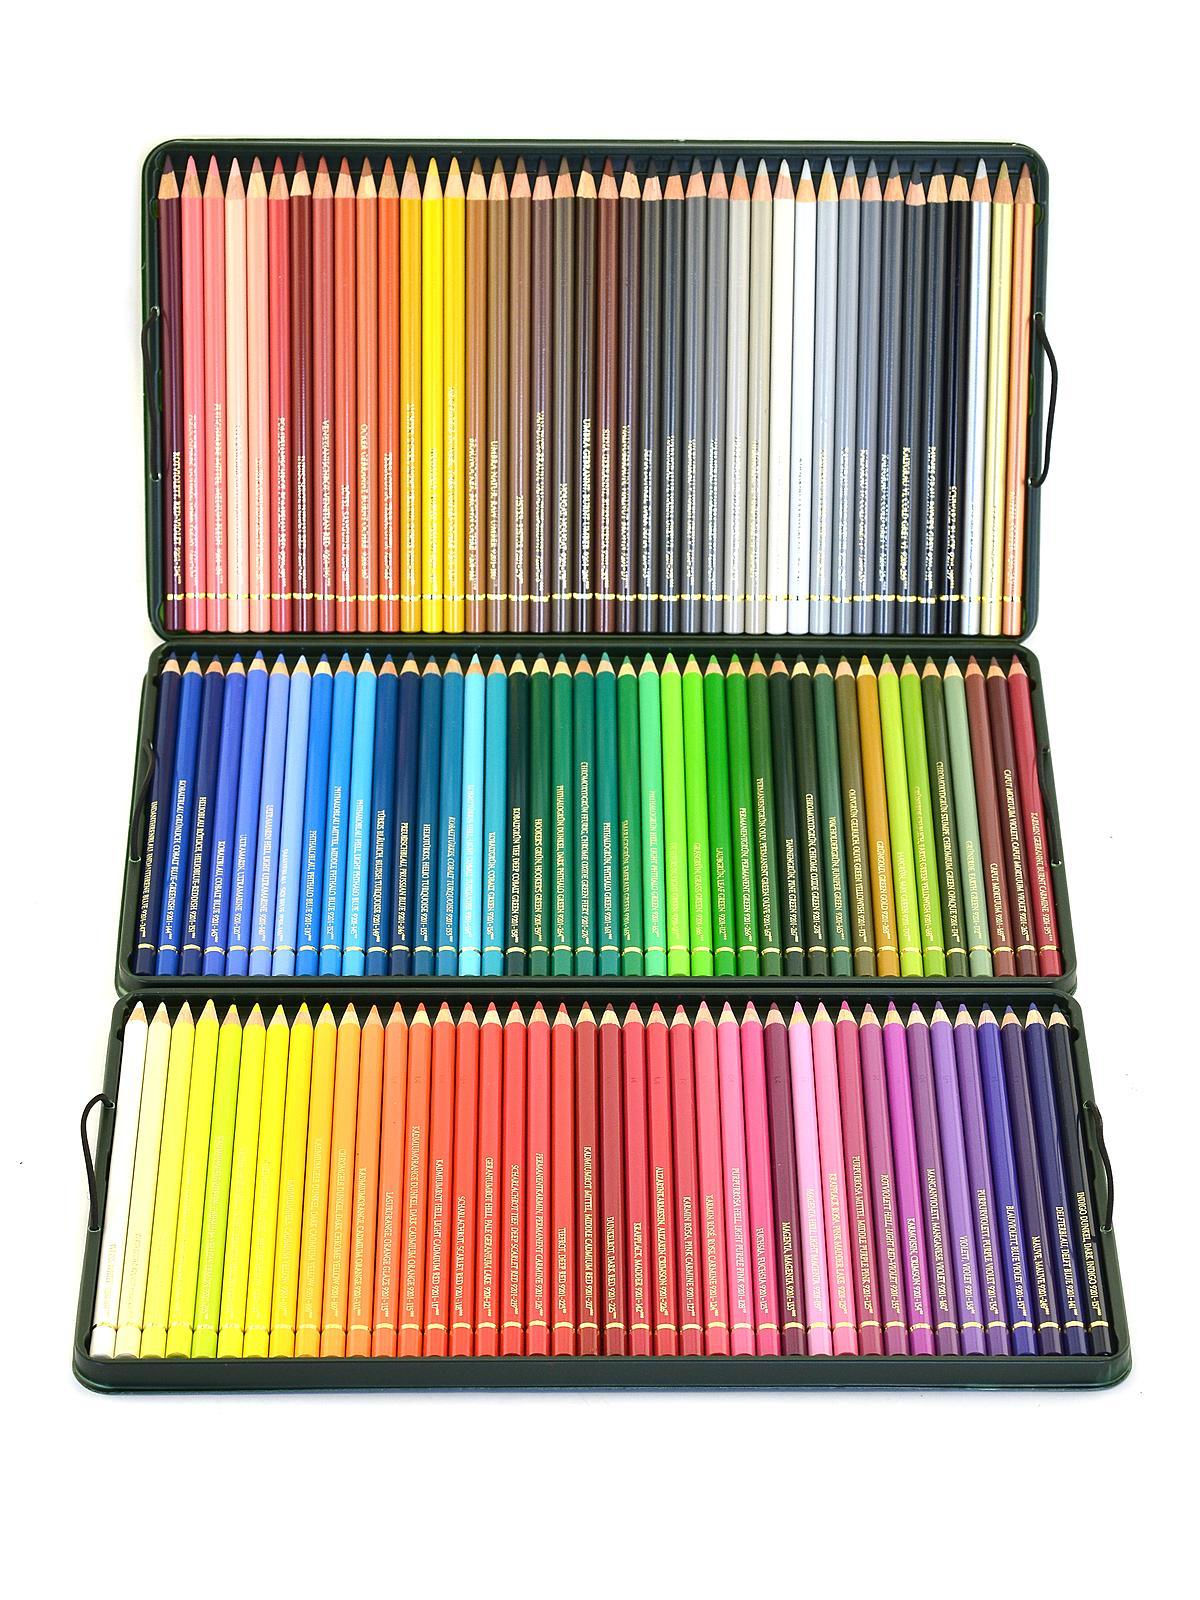 faber castell polychromos colored pencil sets. Black Bedroom Furniture Sets. Home Design Ideas